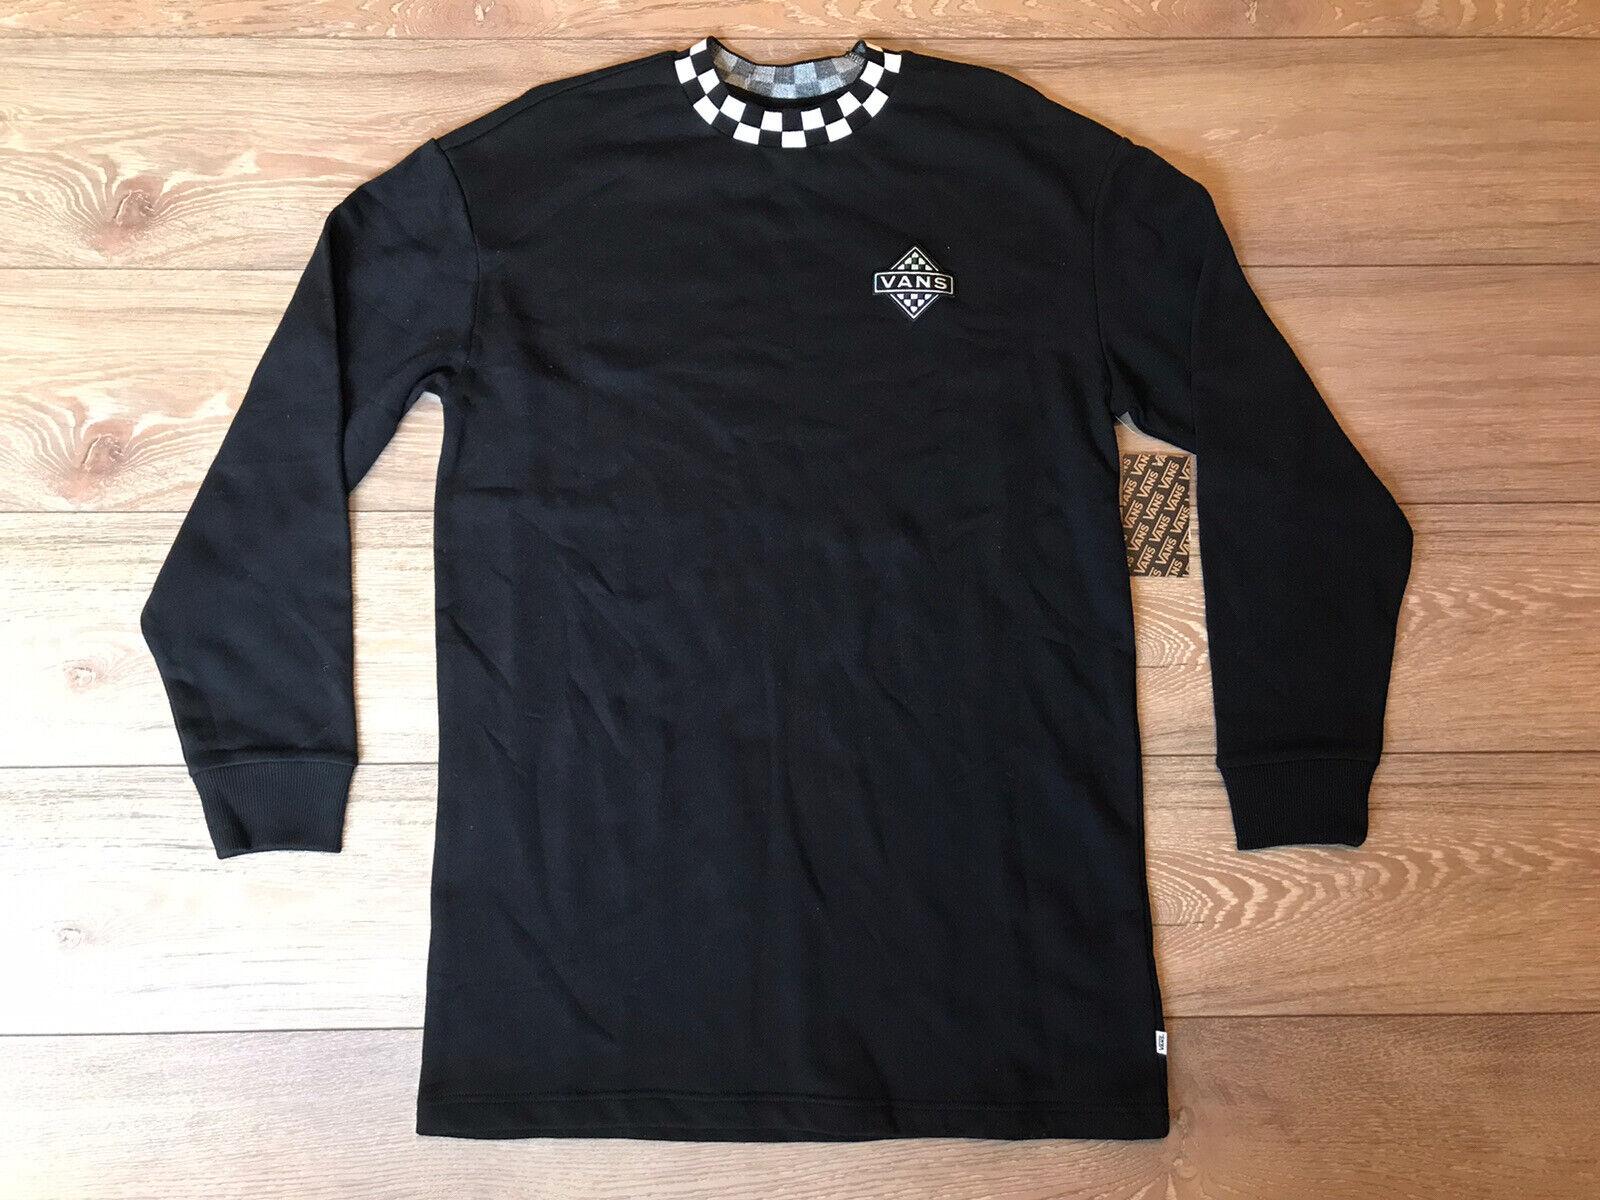 VANS Sonic Boom Sweatshirt Dress Crew Black White Womens SZ S (VN0A53KTBLK) NWT!